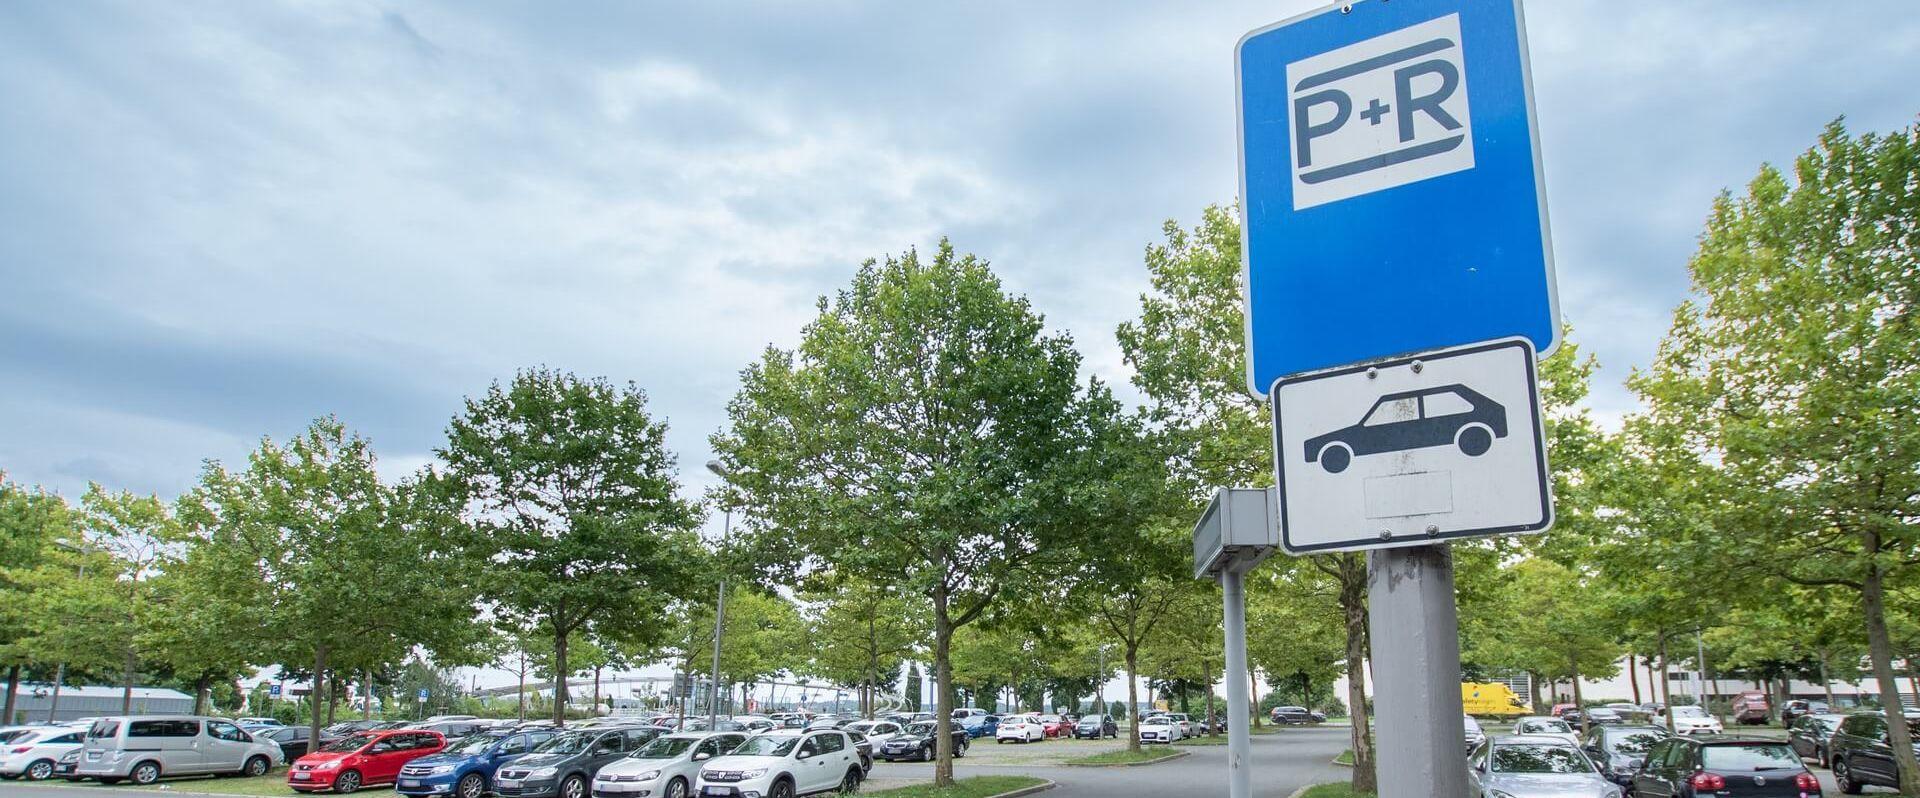 P+R Parkplatz Dortmund